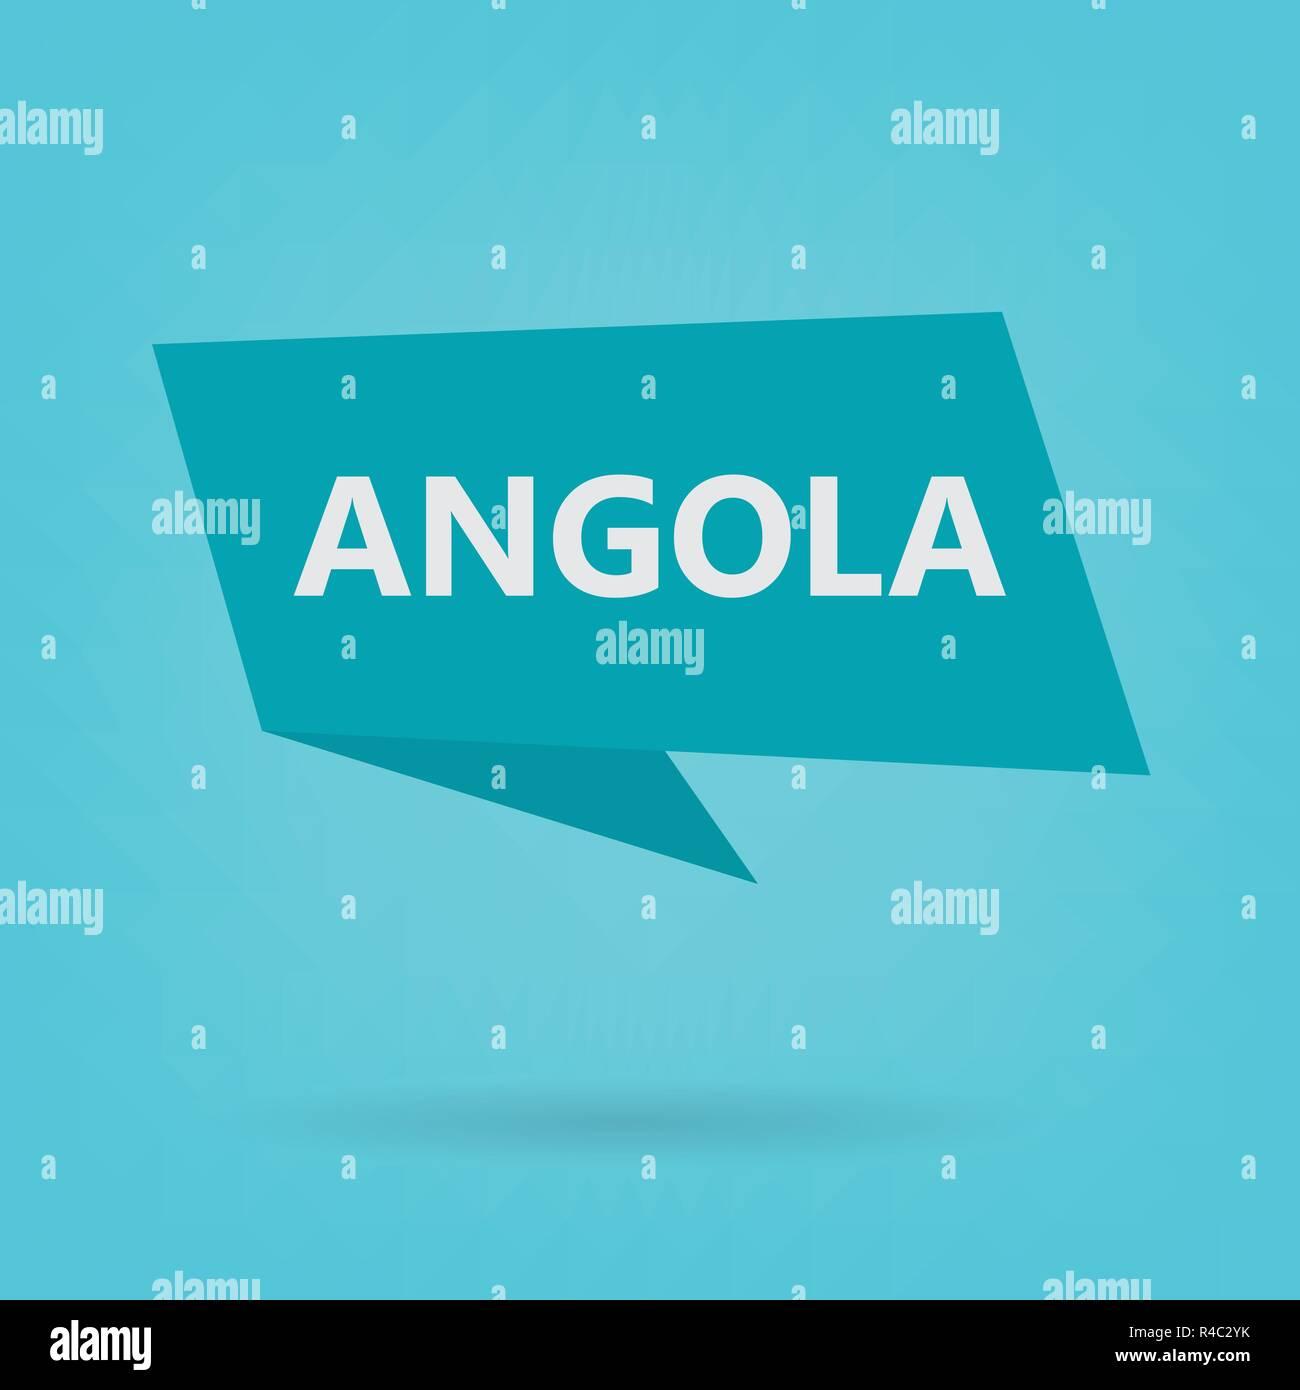 Angola word on a speech bubble- vector illustration - Stock Vector